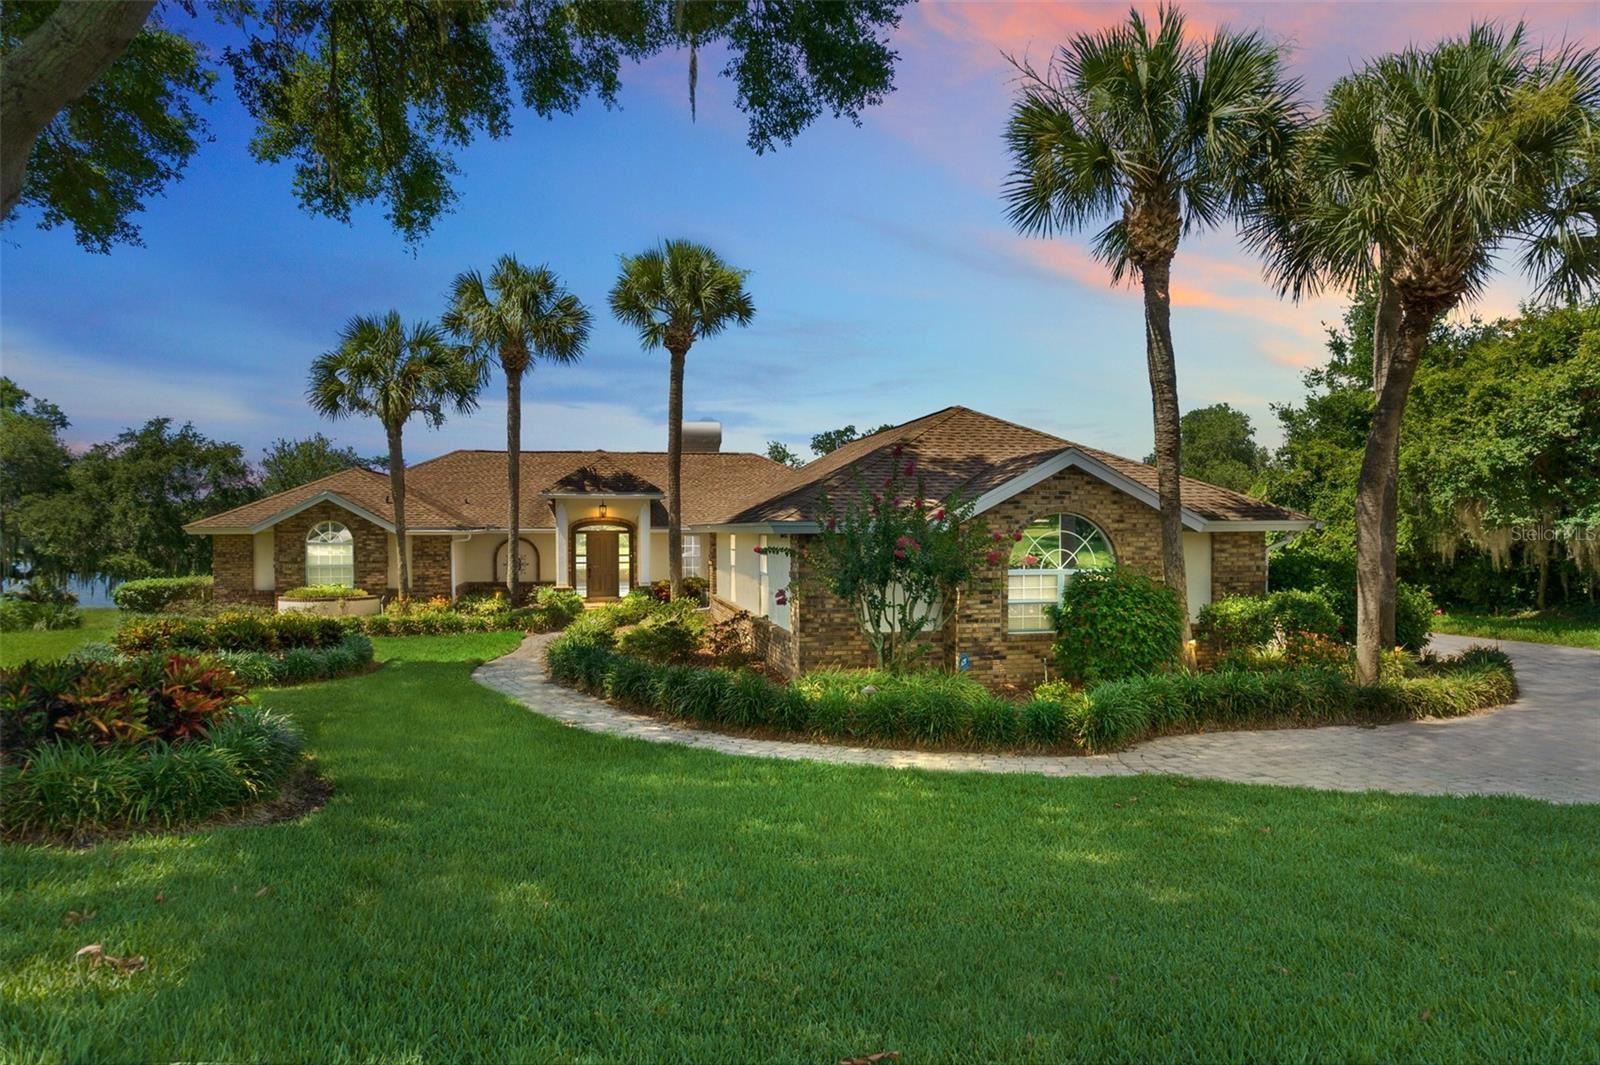 17801 BONNIEVISTA COURT, Winter Garden, FL 34787 - #: O5951572